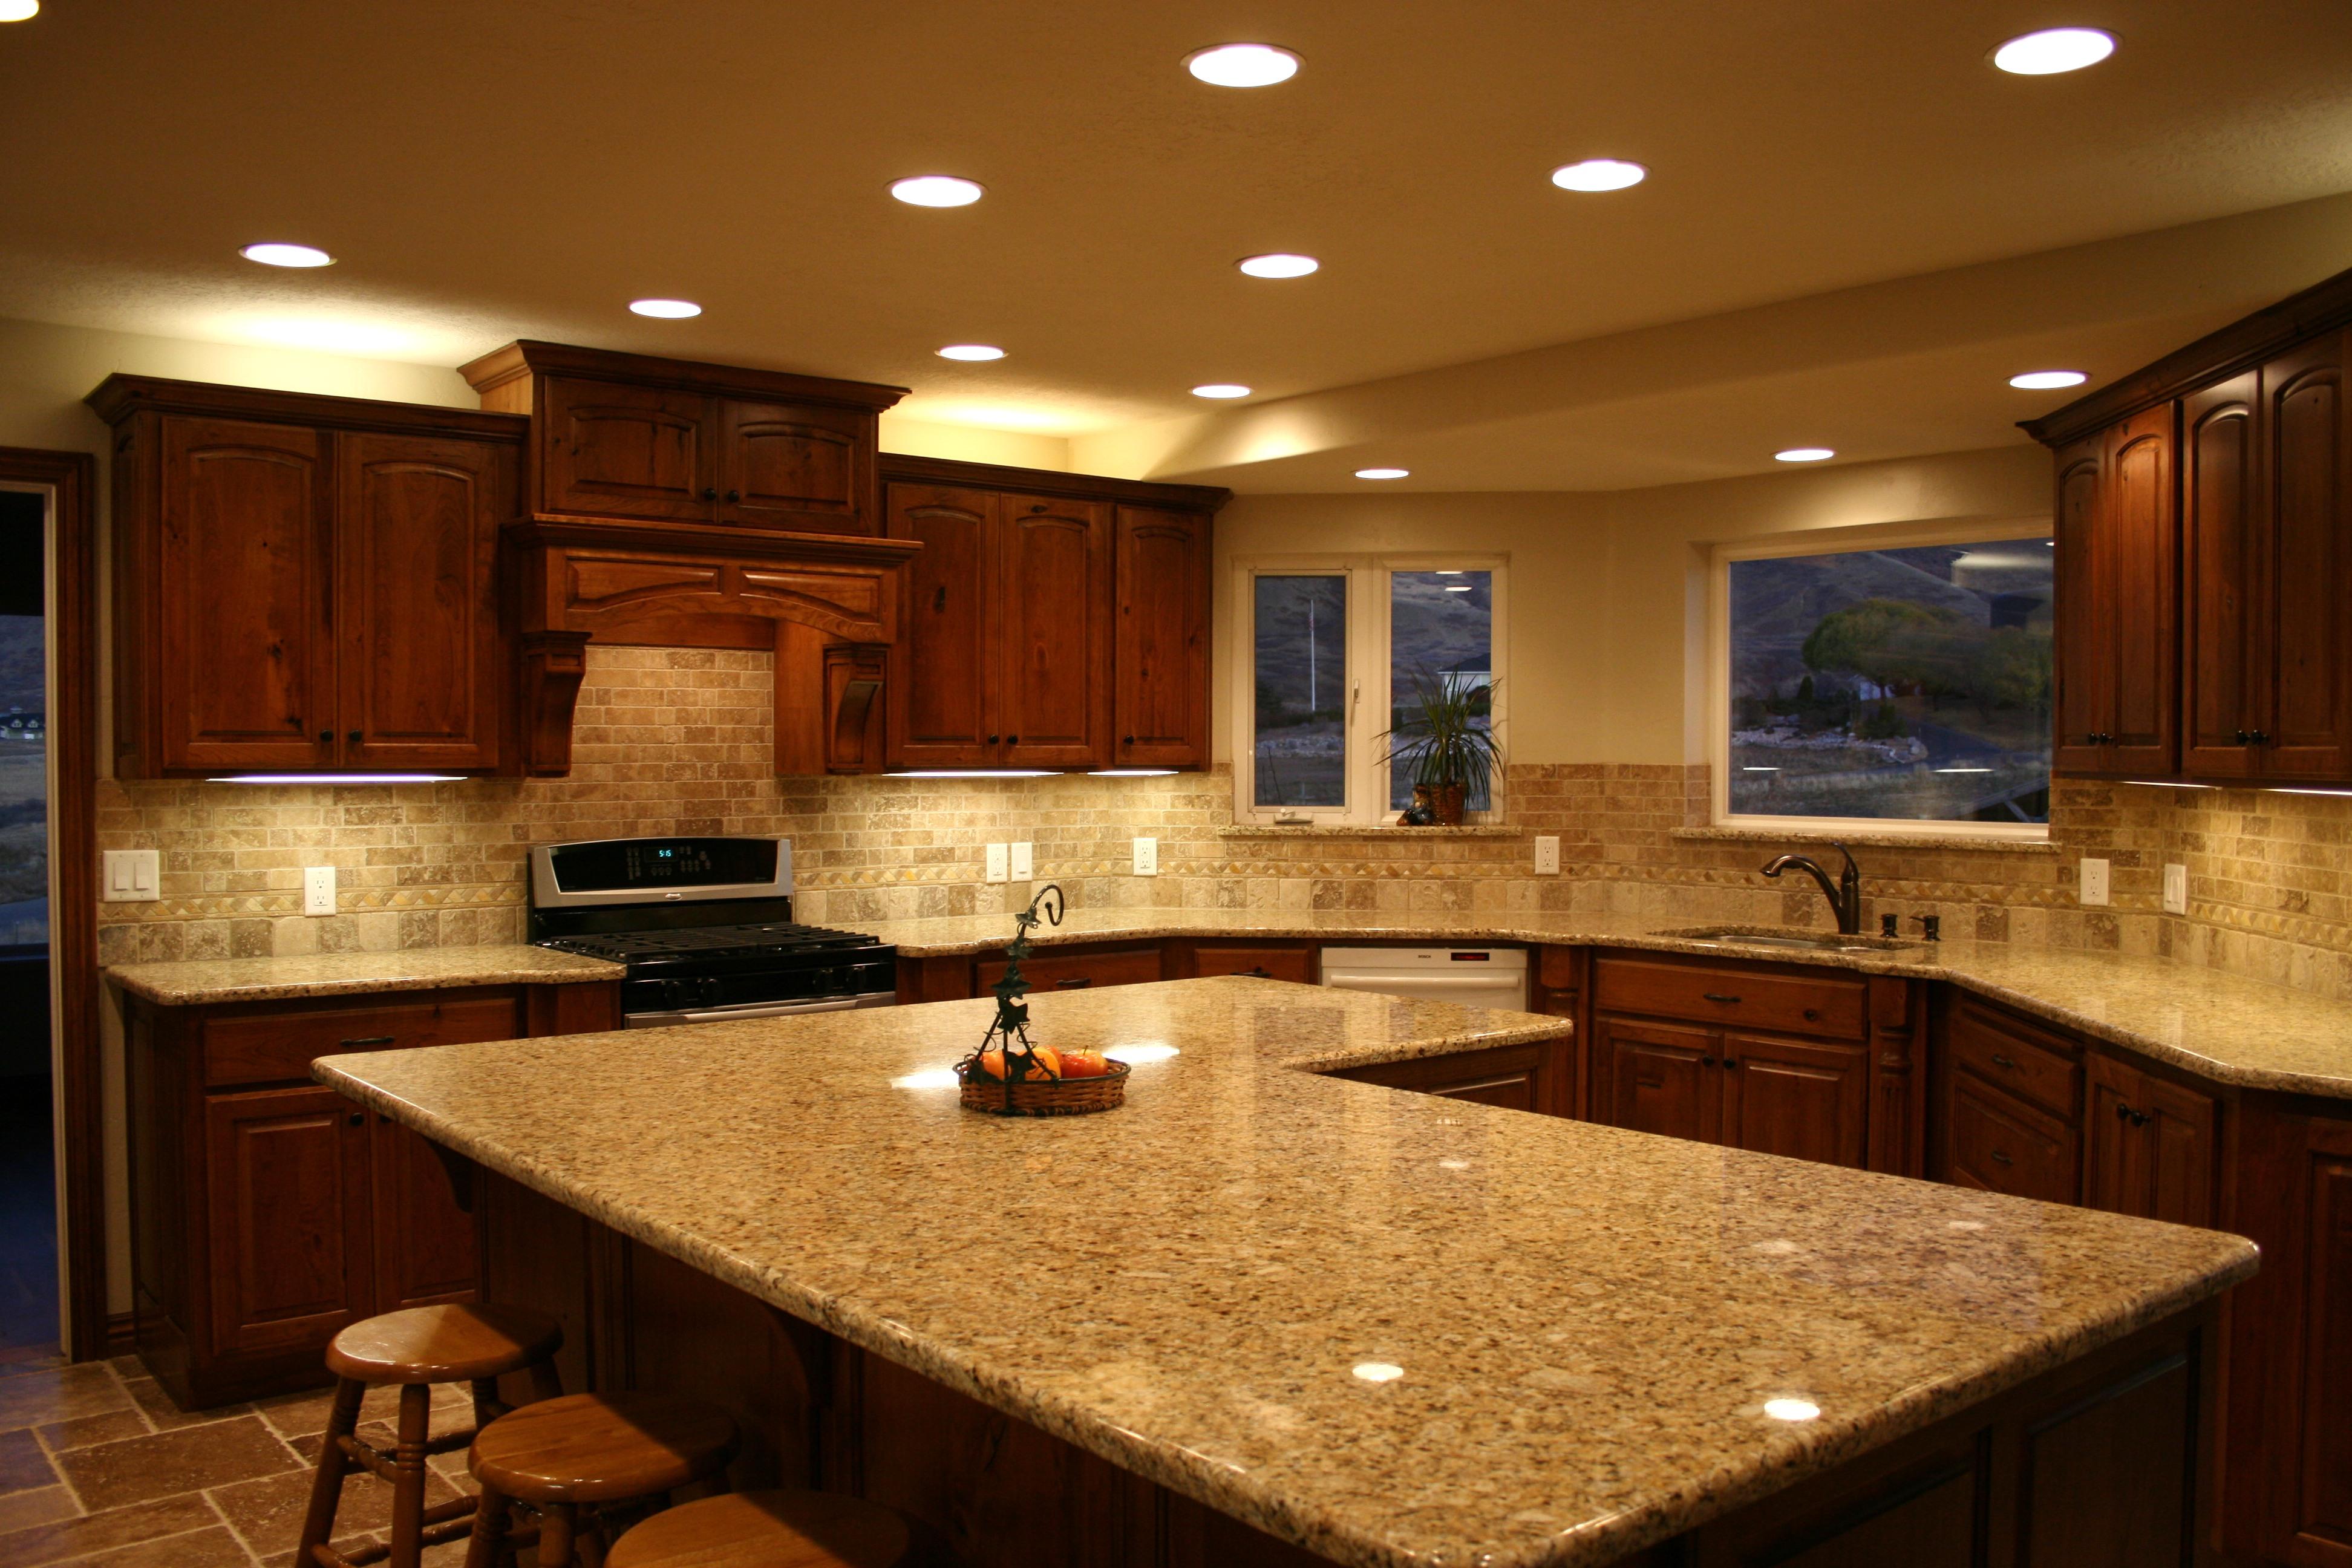 20 kitchen countertop materials kitchen countertop material granite countertops in kitchens pictures itkb3sed